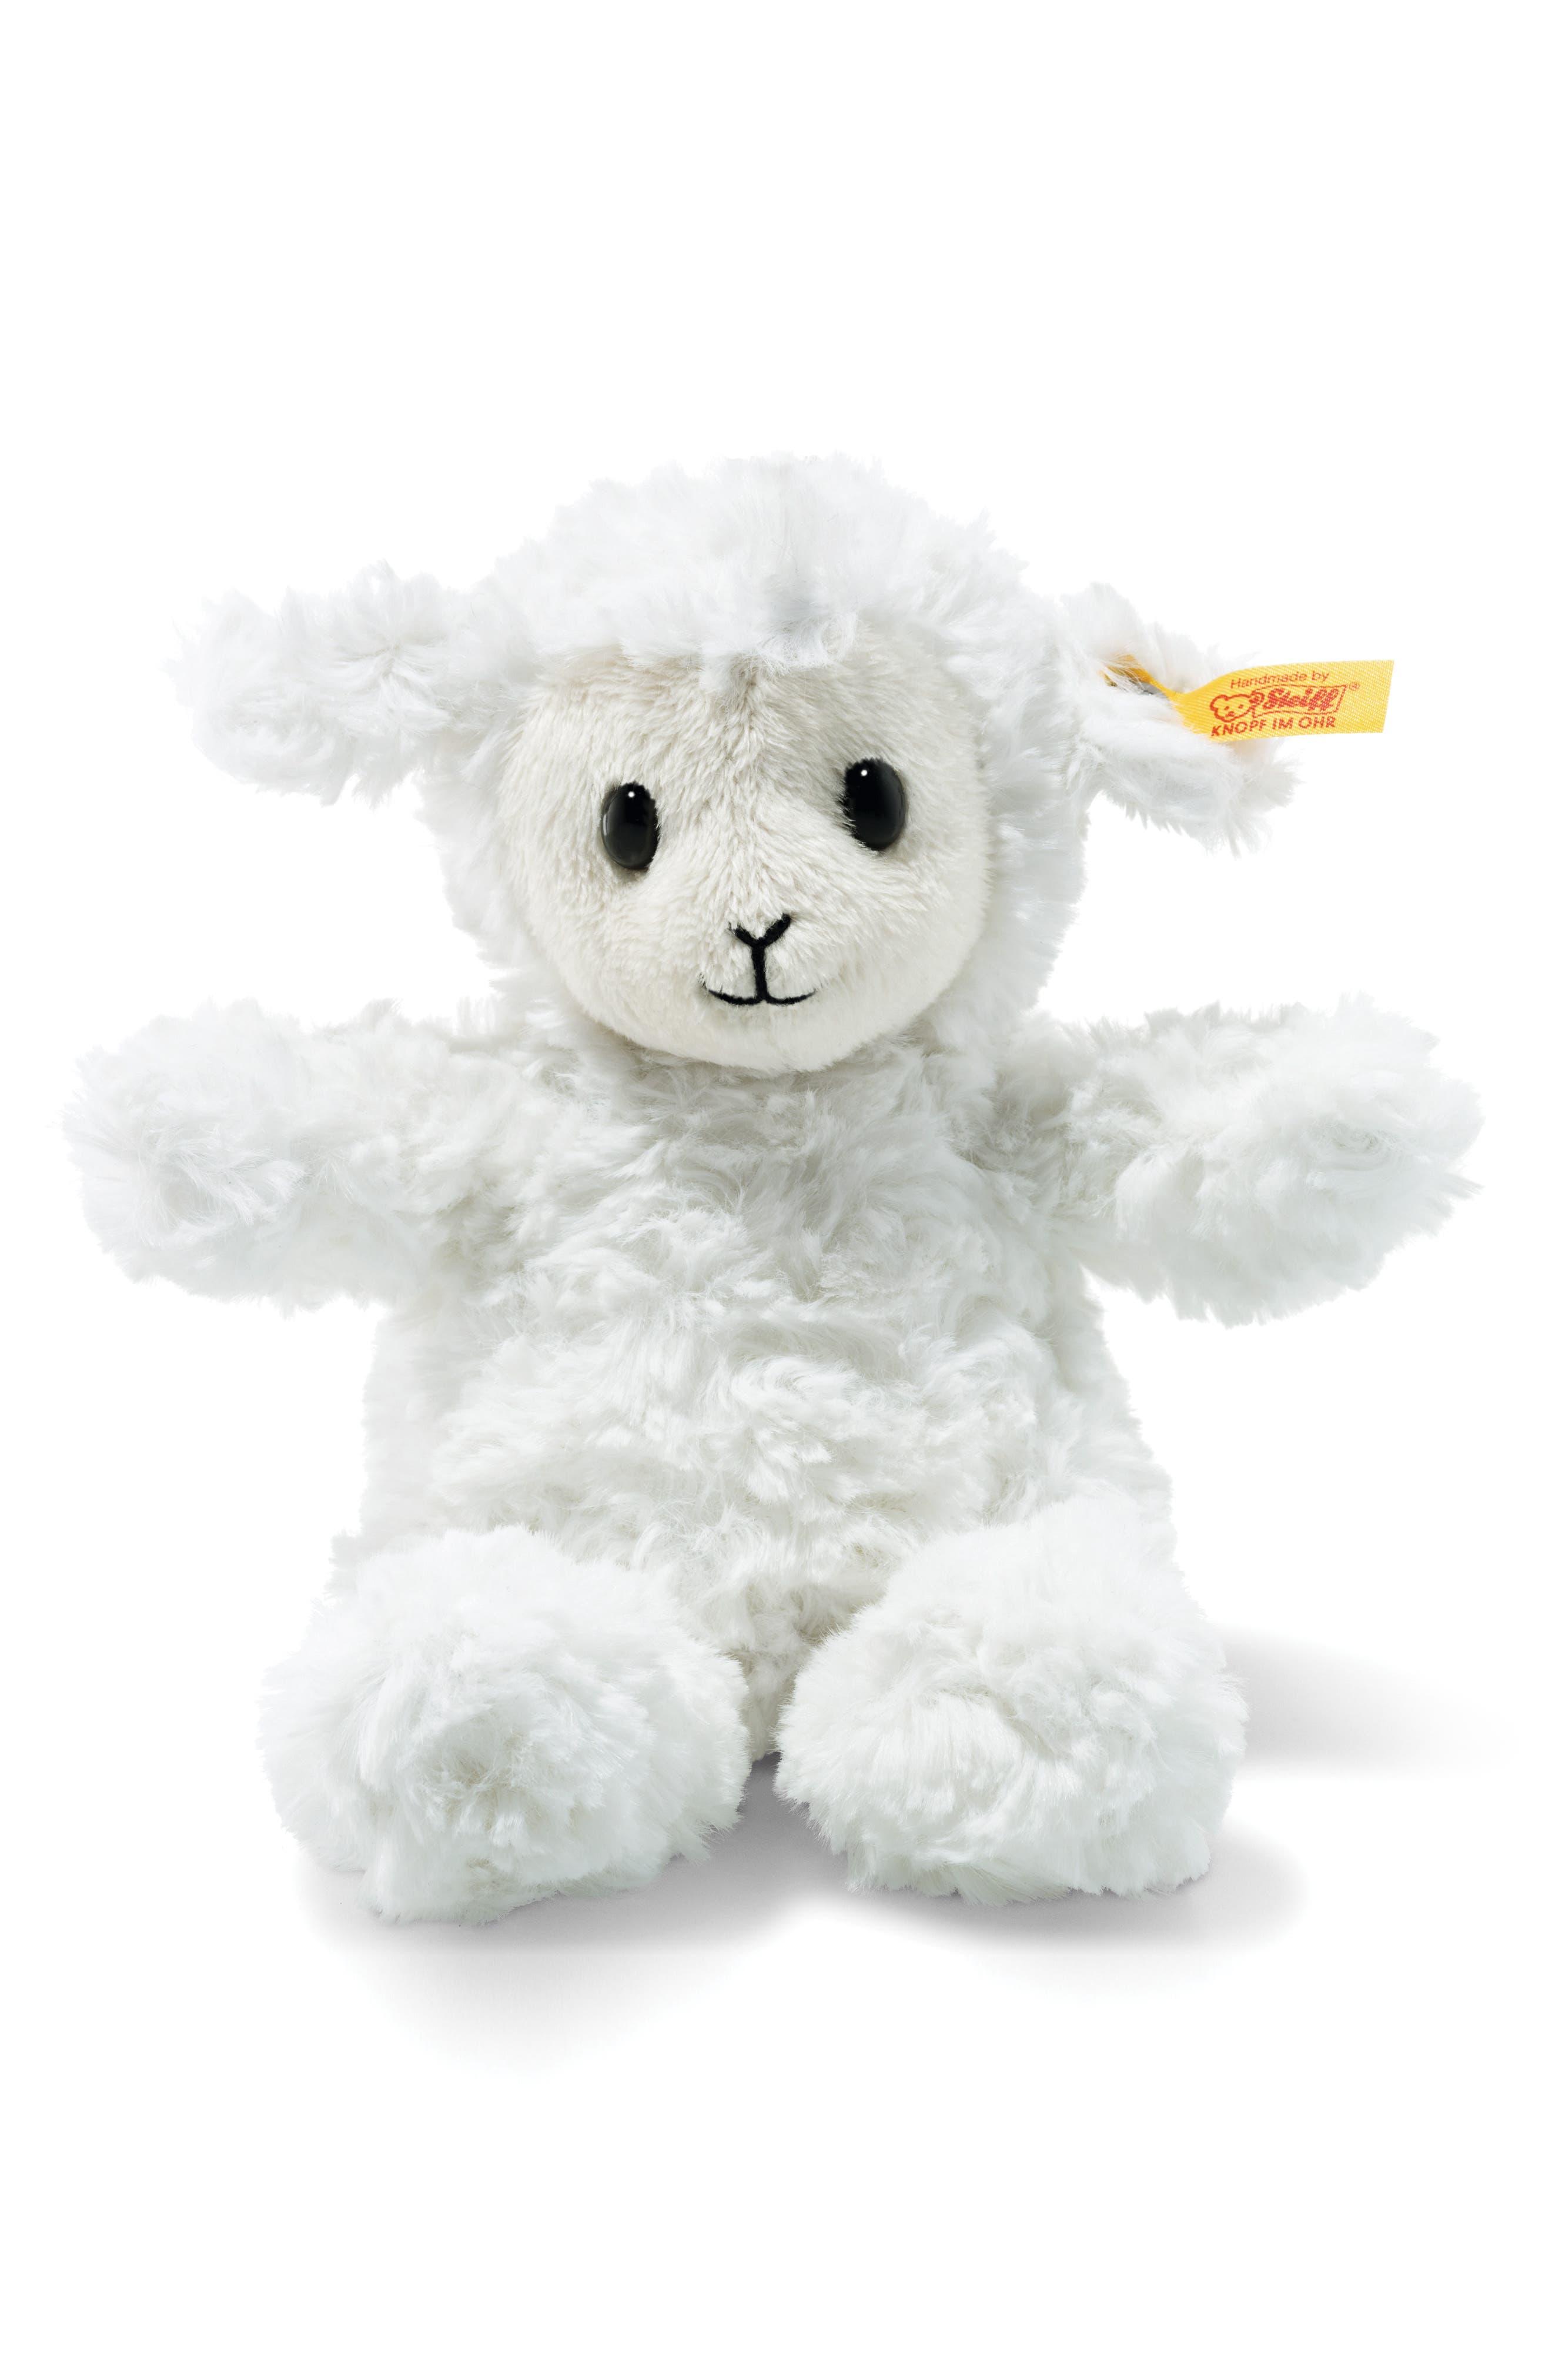 Steiff Fuzzy Lamb Stuffed Animal